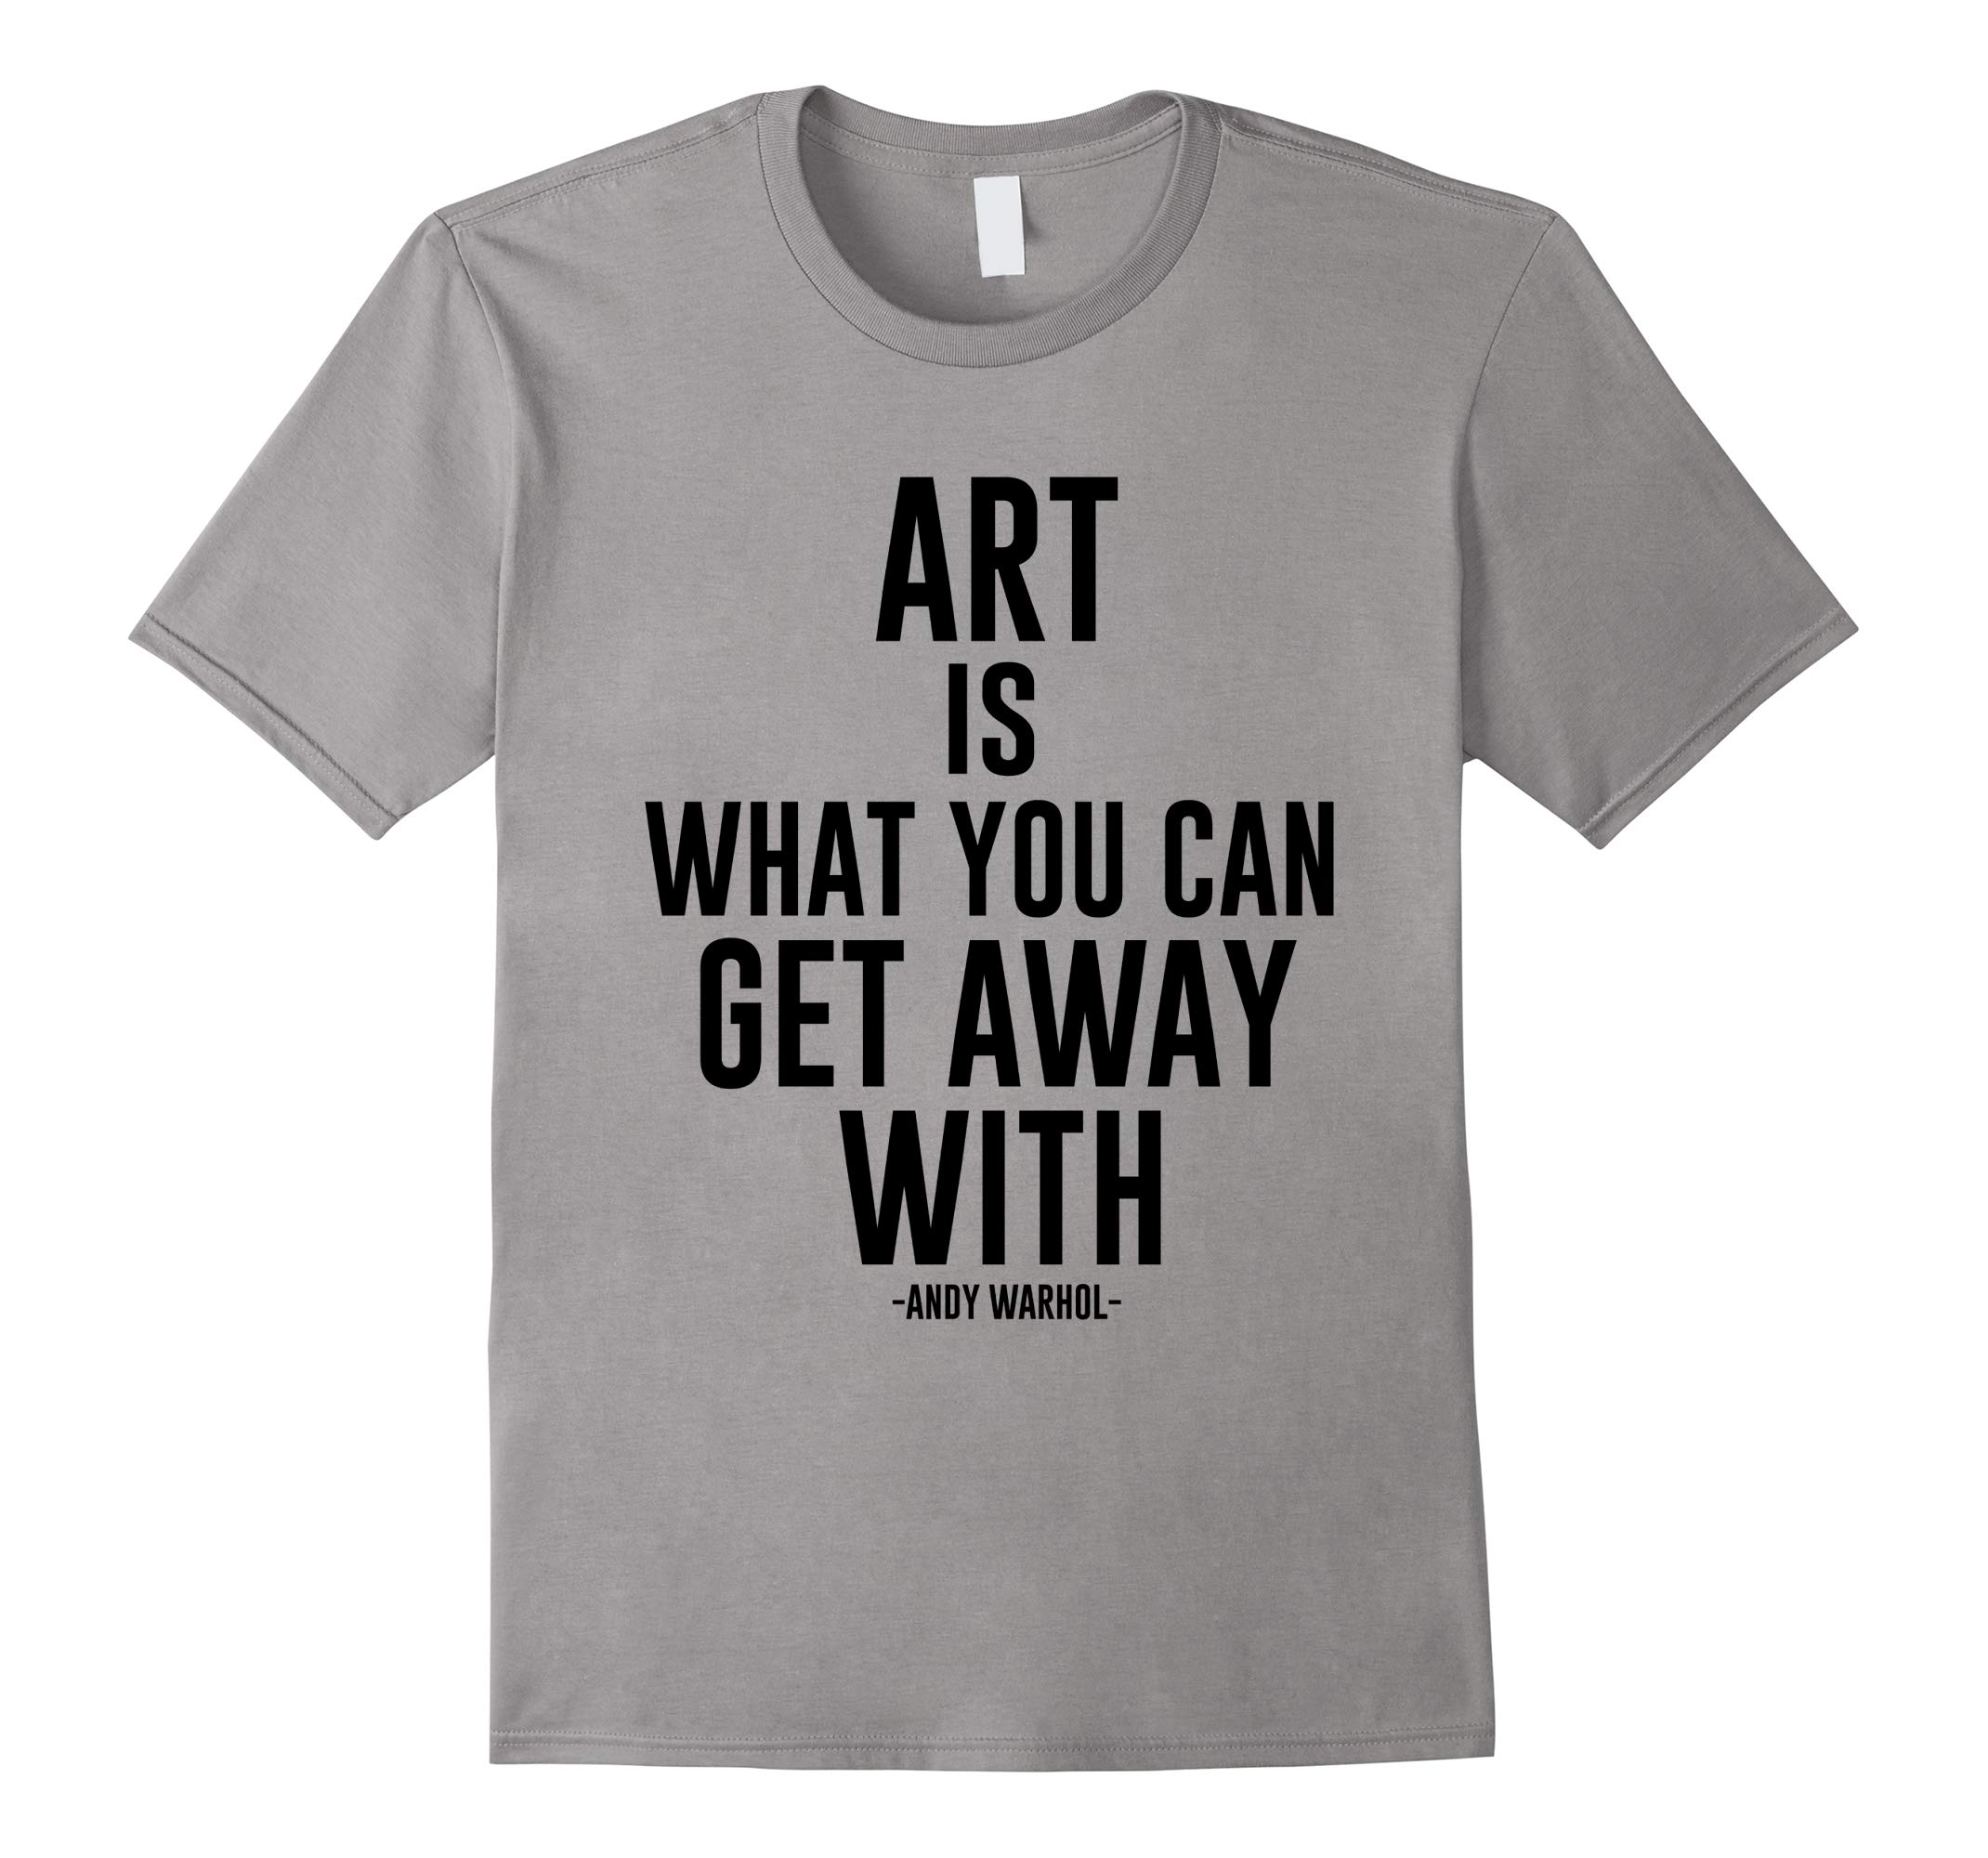 Artistic Statement Shirt Funny Novelty Art Tee-RT